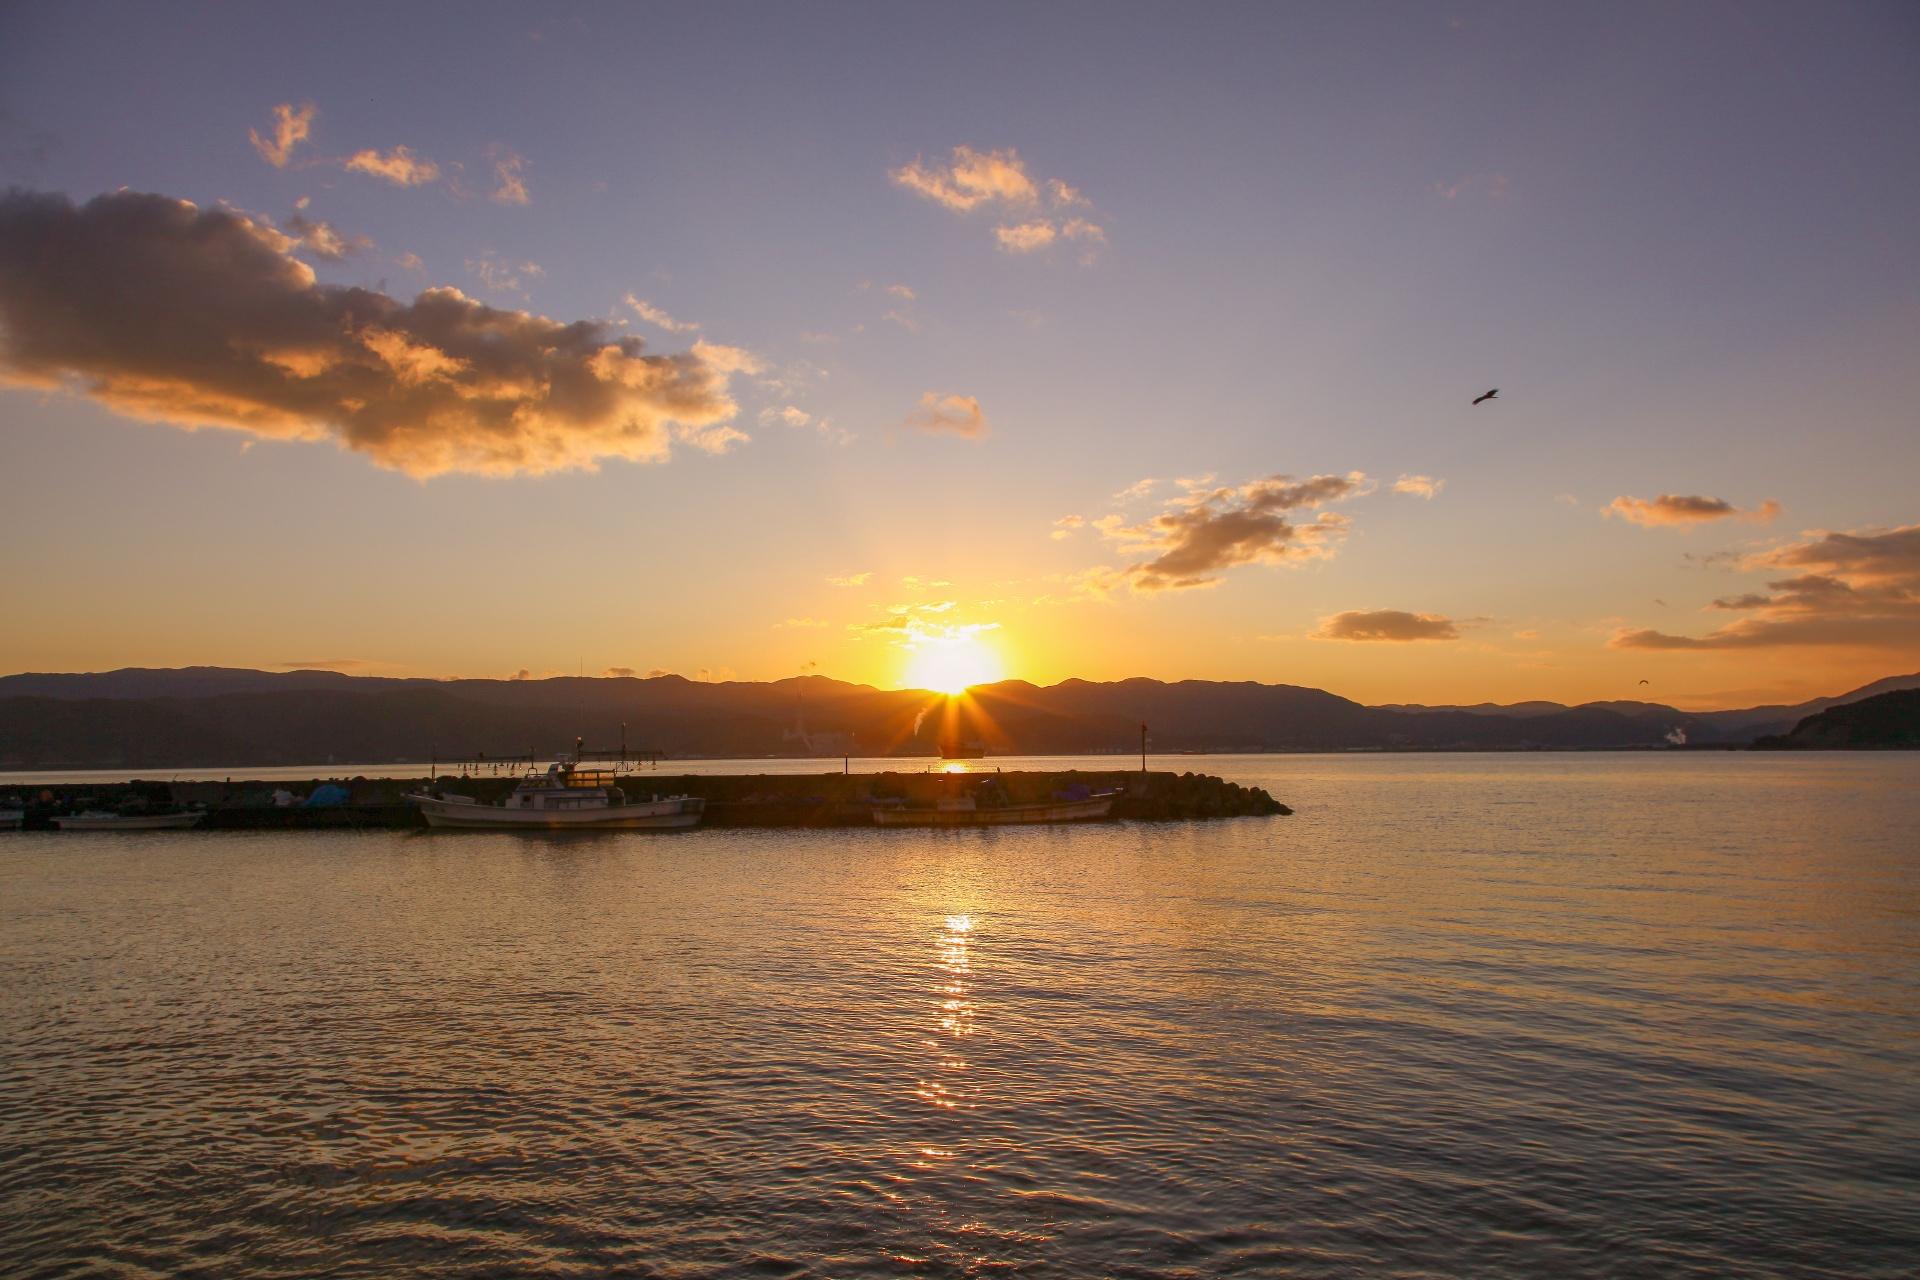 日本海の朝日 若狭湾 福井の風景